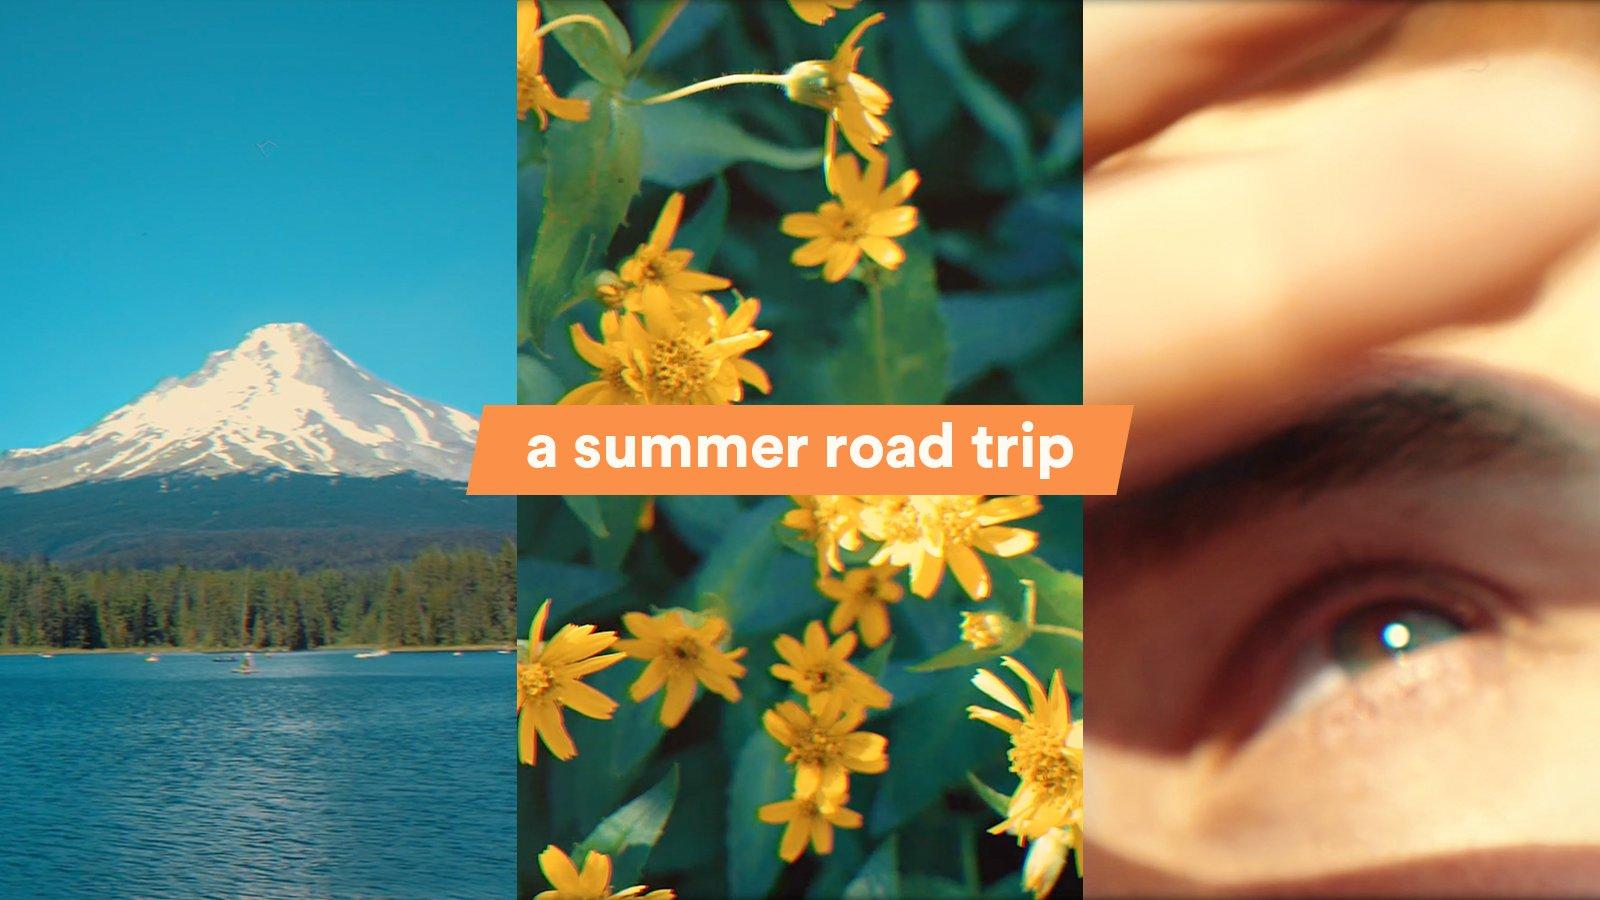 new video | a summer road trip | https://t.co/KmRNEHpQ6Z ��������♂️ https://t.co/XATfOJJ3LB